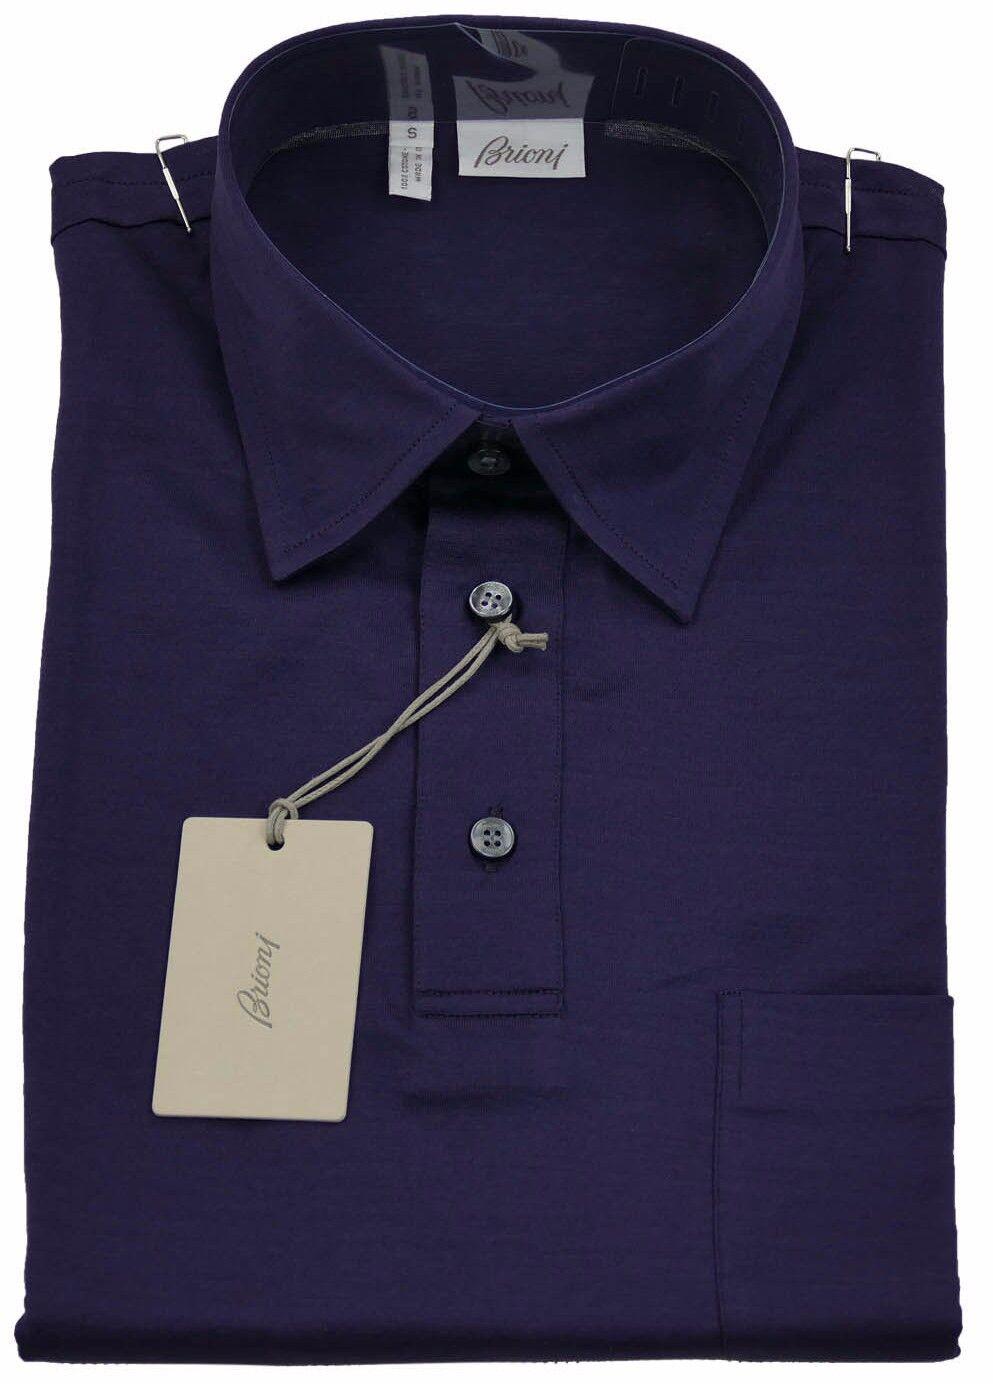 Brioni Mens Polo T Shirt Handmade SZ S  EU 46 UK 36 Made in italy Cotton  | Großer Verkauf